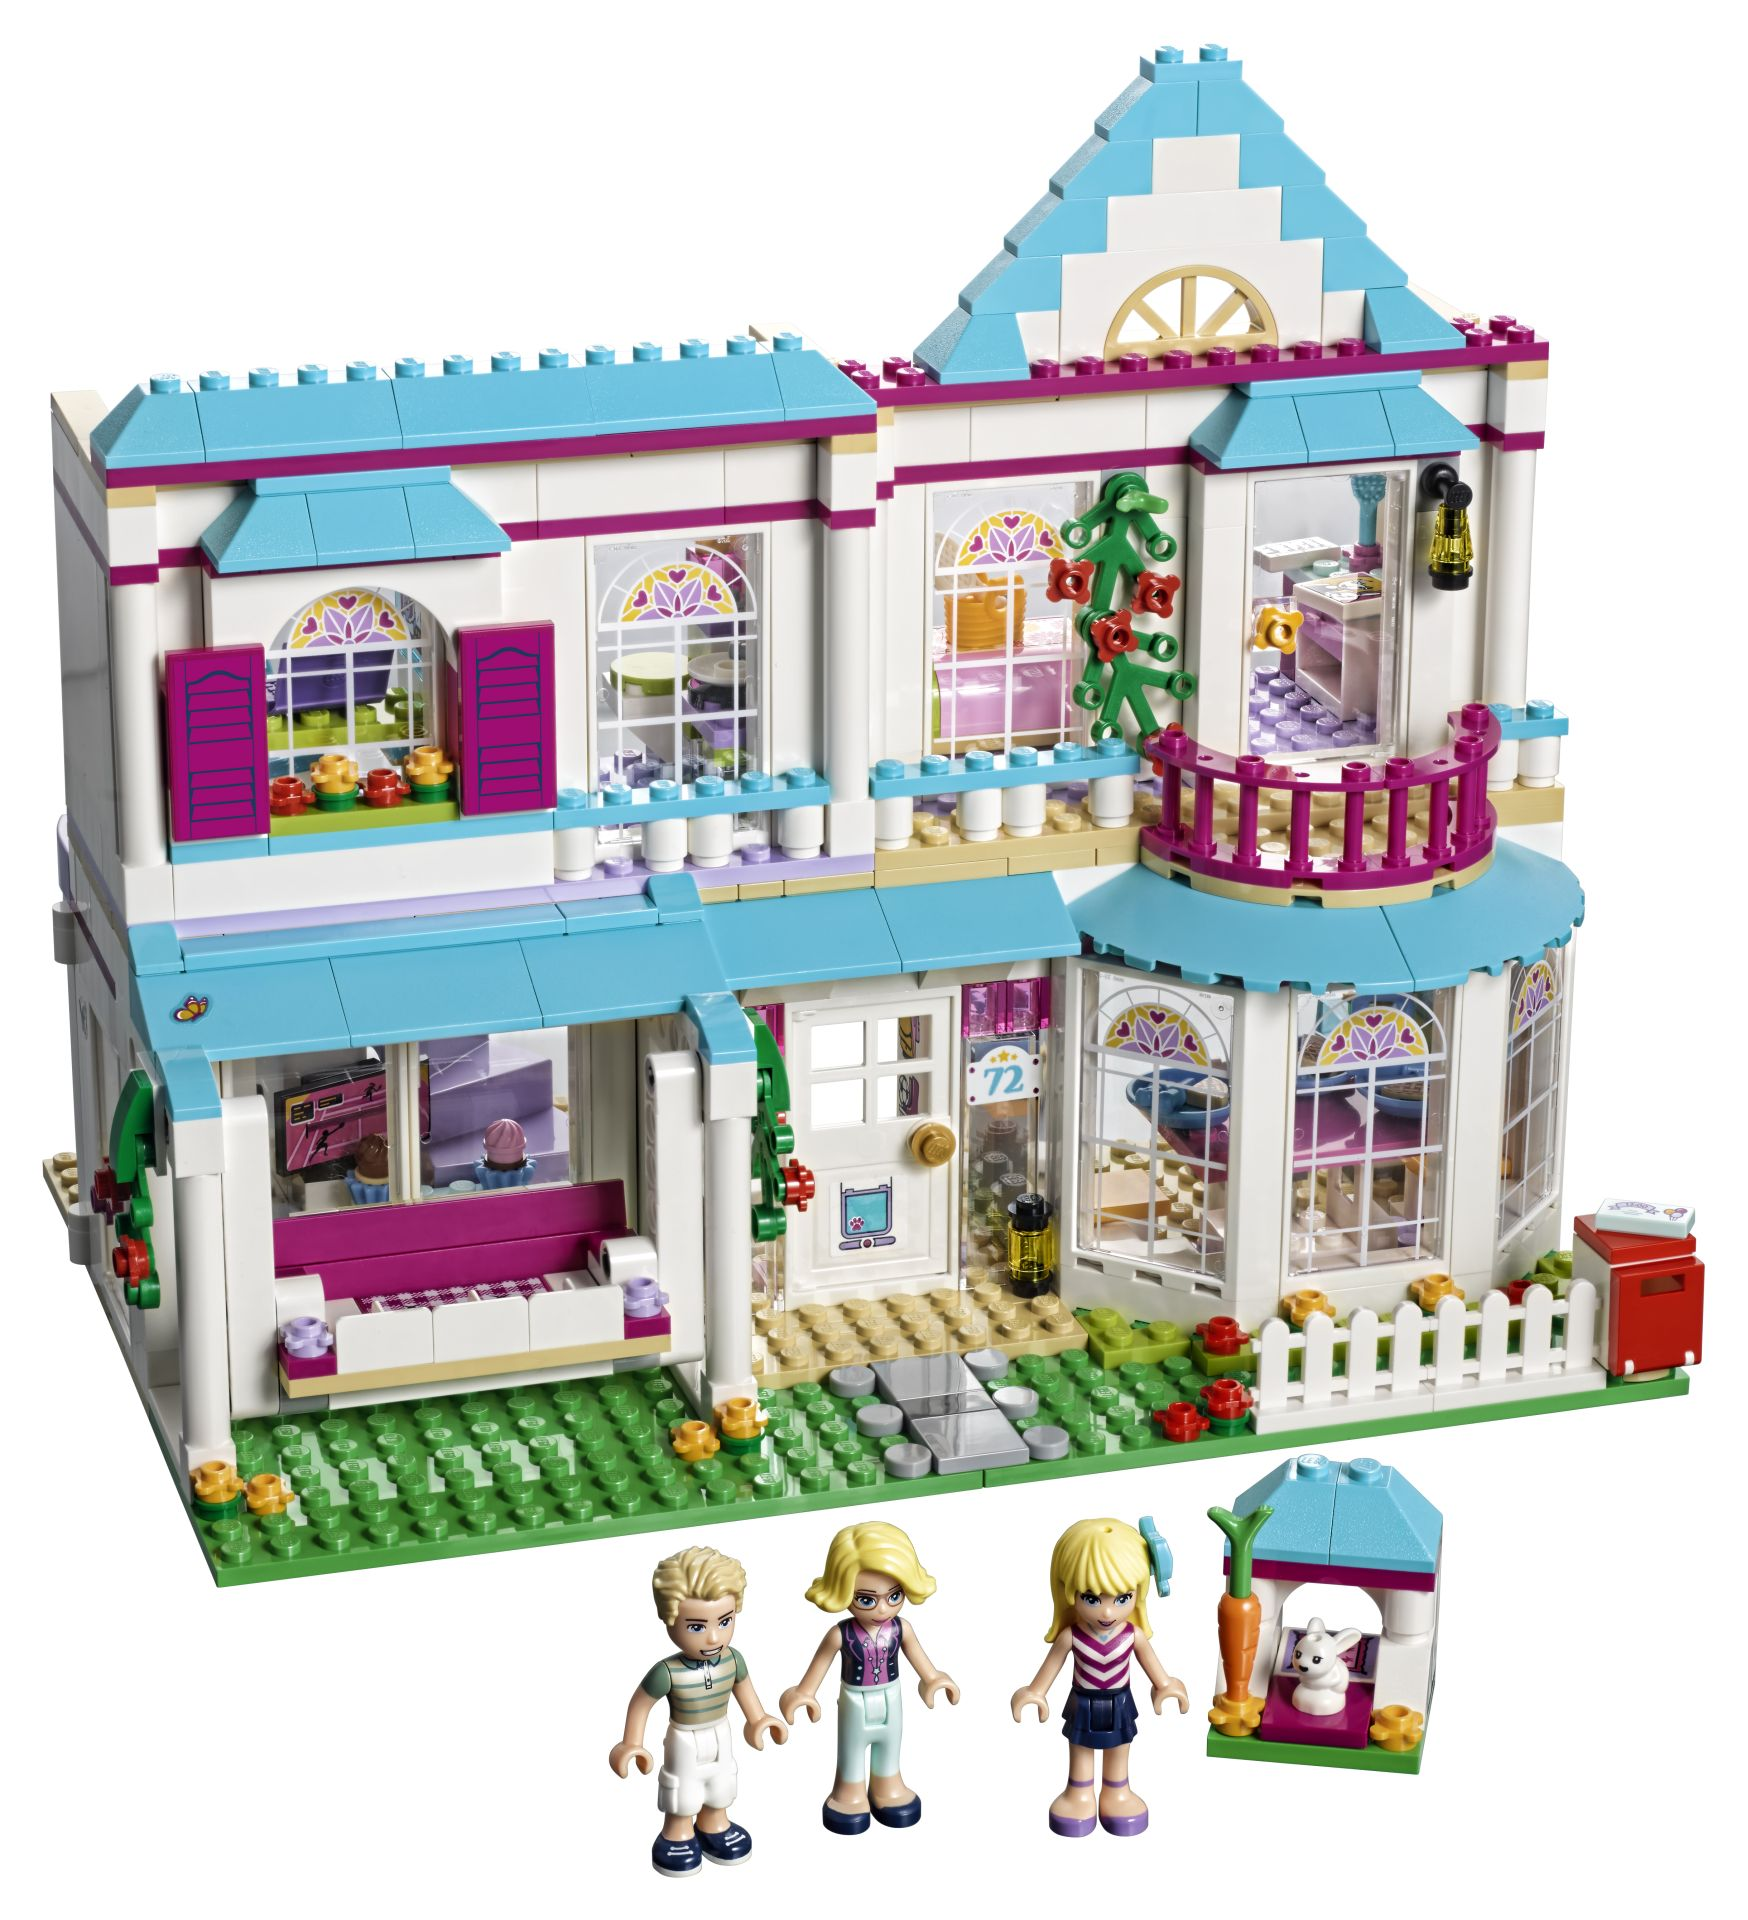 lego friends 41314 stephanies haus g nstig online kaufen. Black Bedroom Furniture Sets. Home Design Ideas